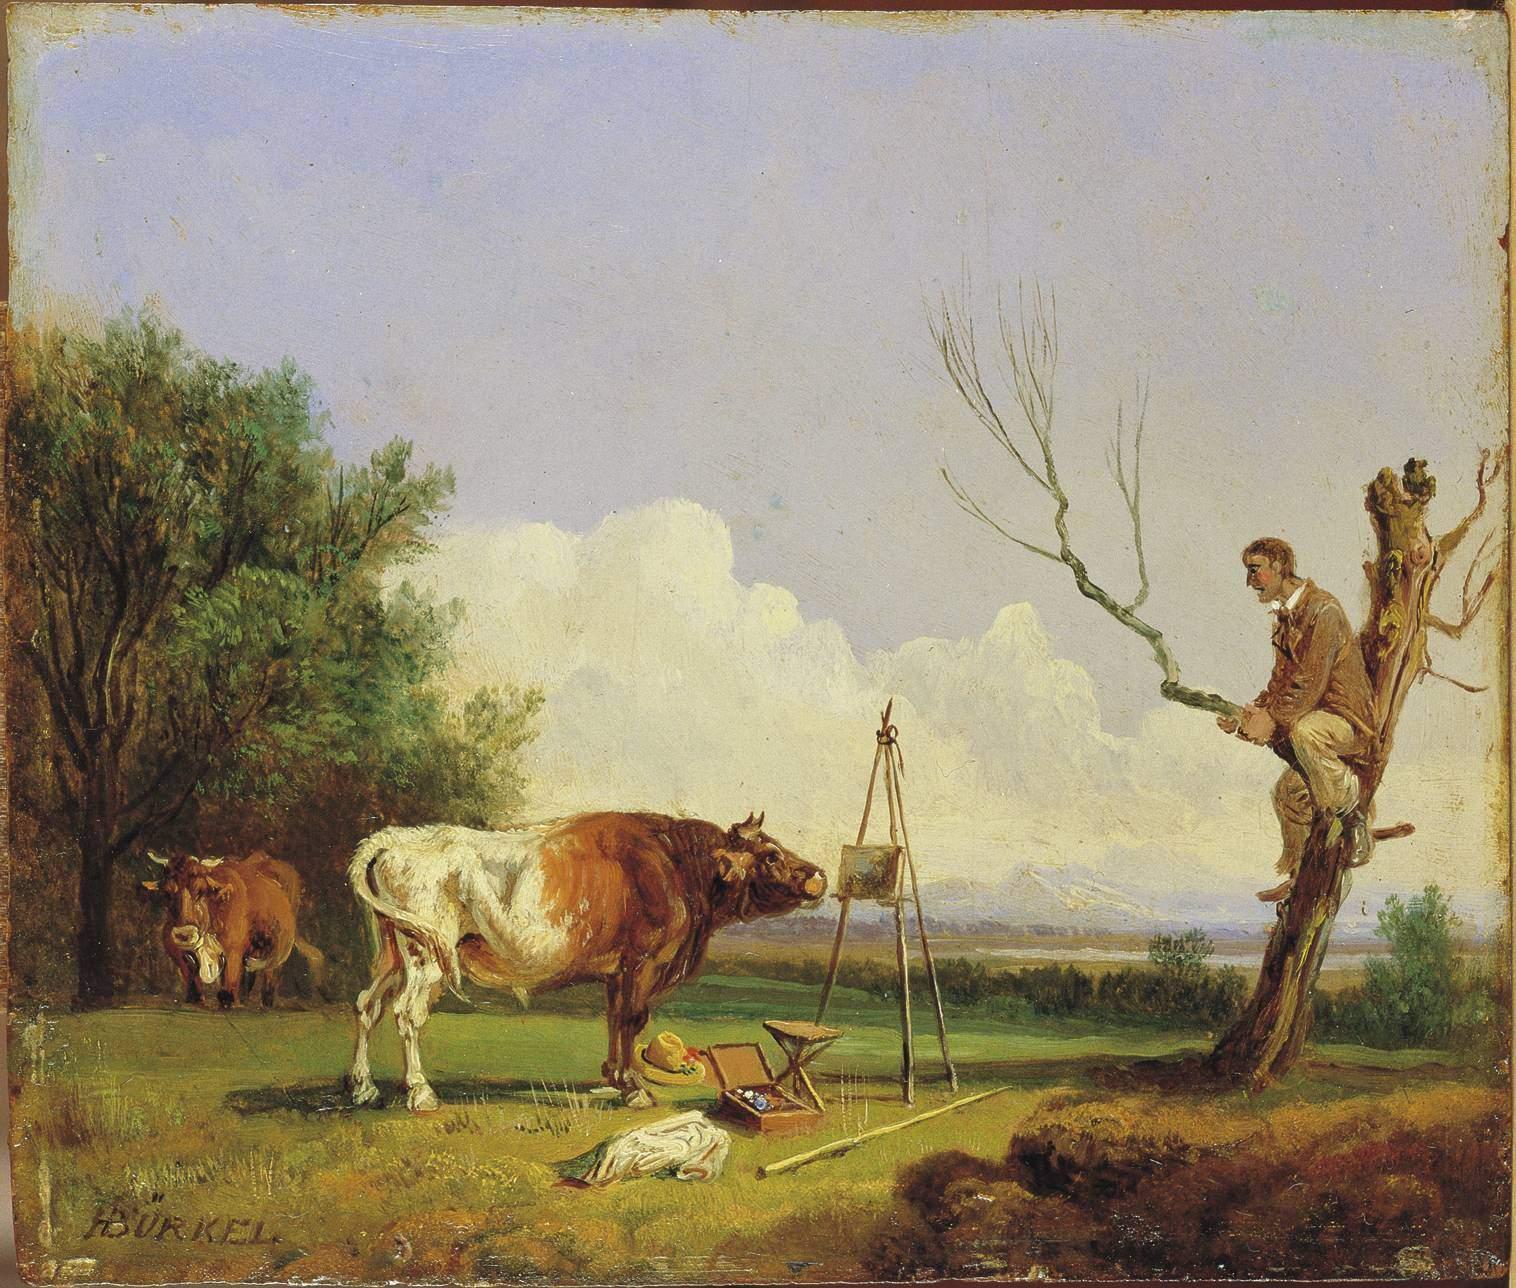 Maler Pirmasens file heinrich bürkel stier und maler jpeg wikimedia commons